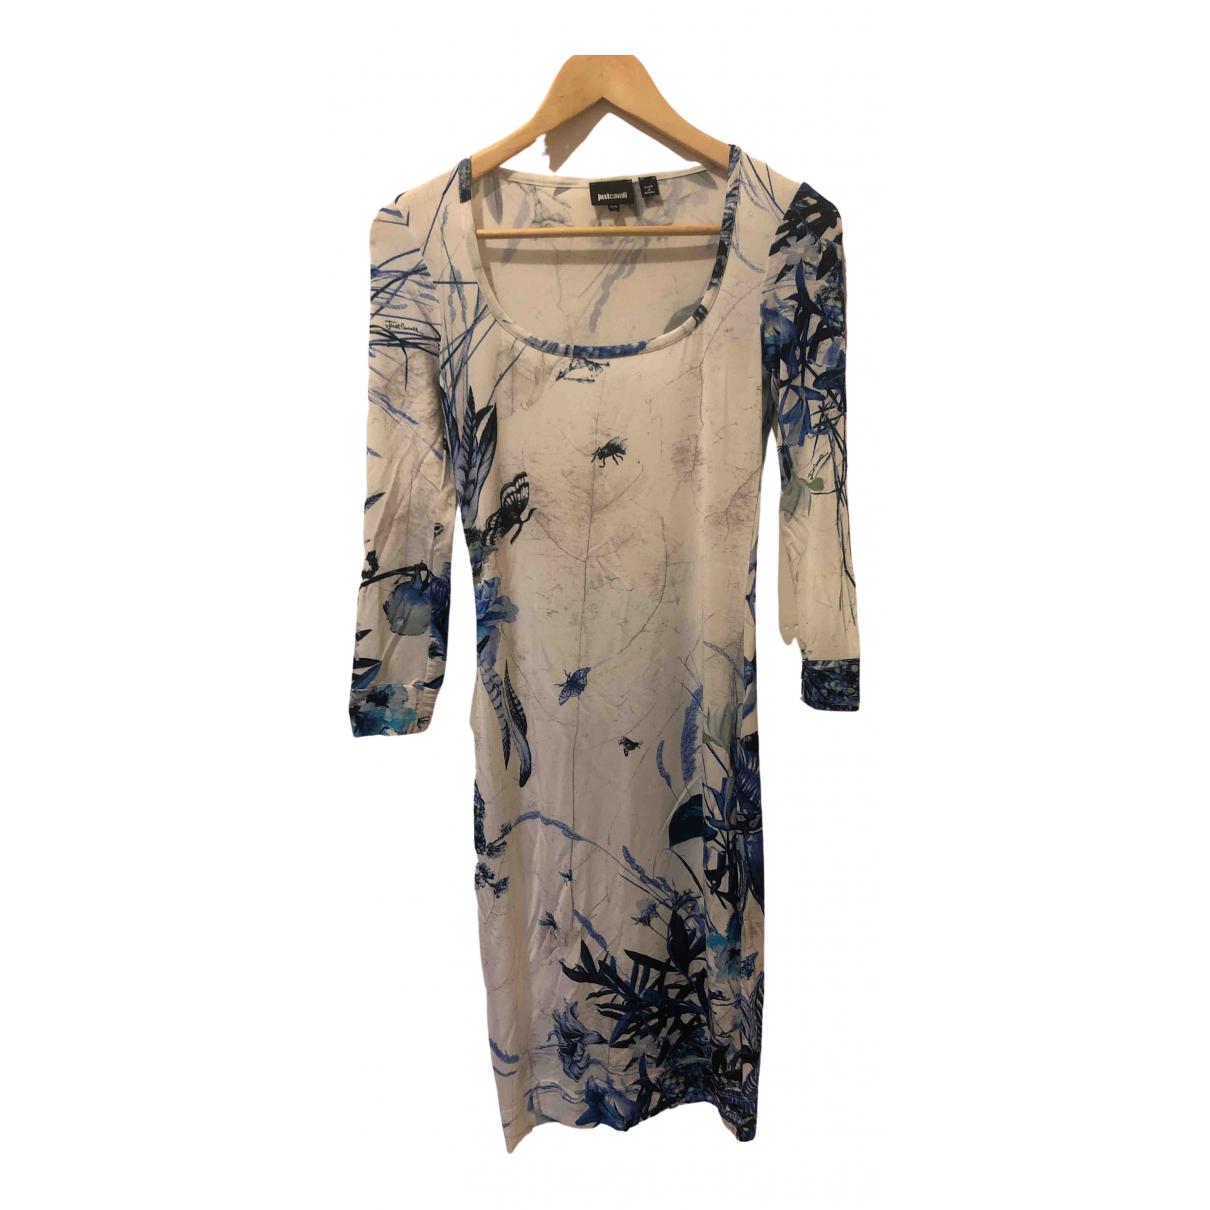 Just Cavalli \N Blue dress for Women XS International